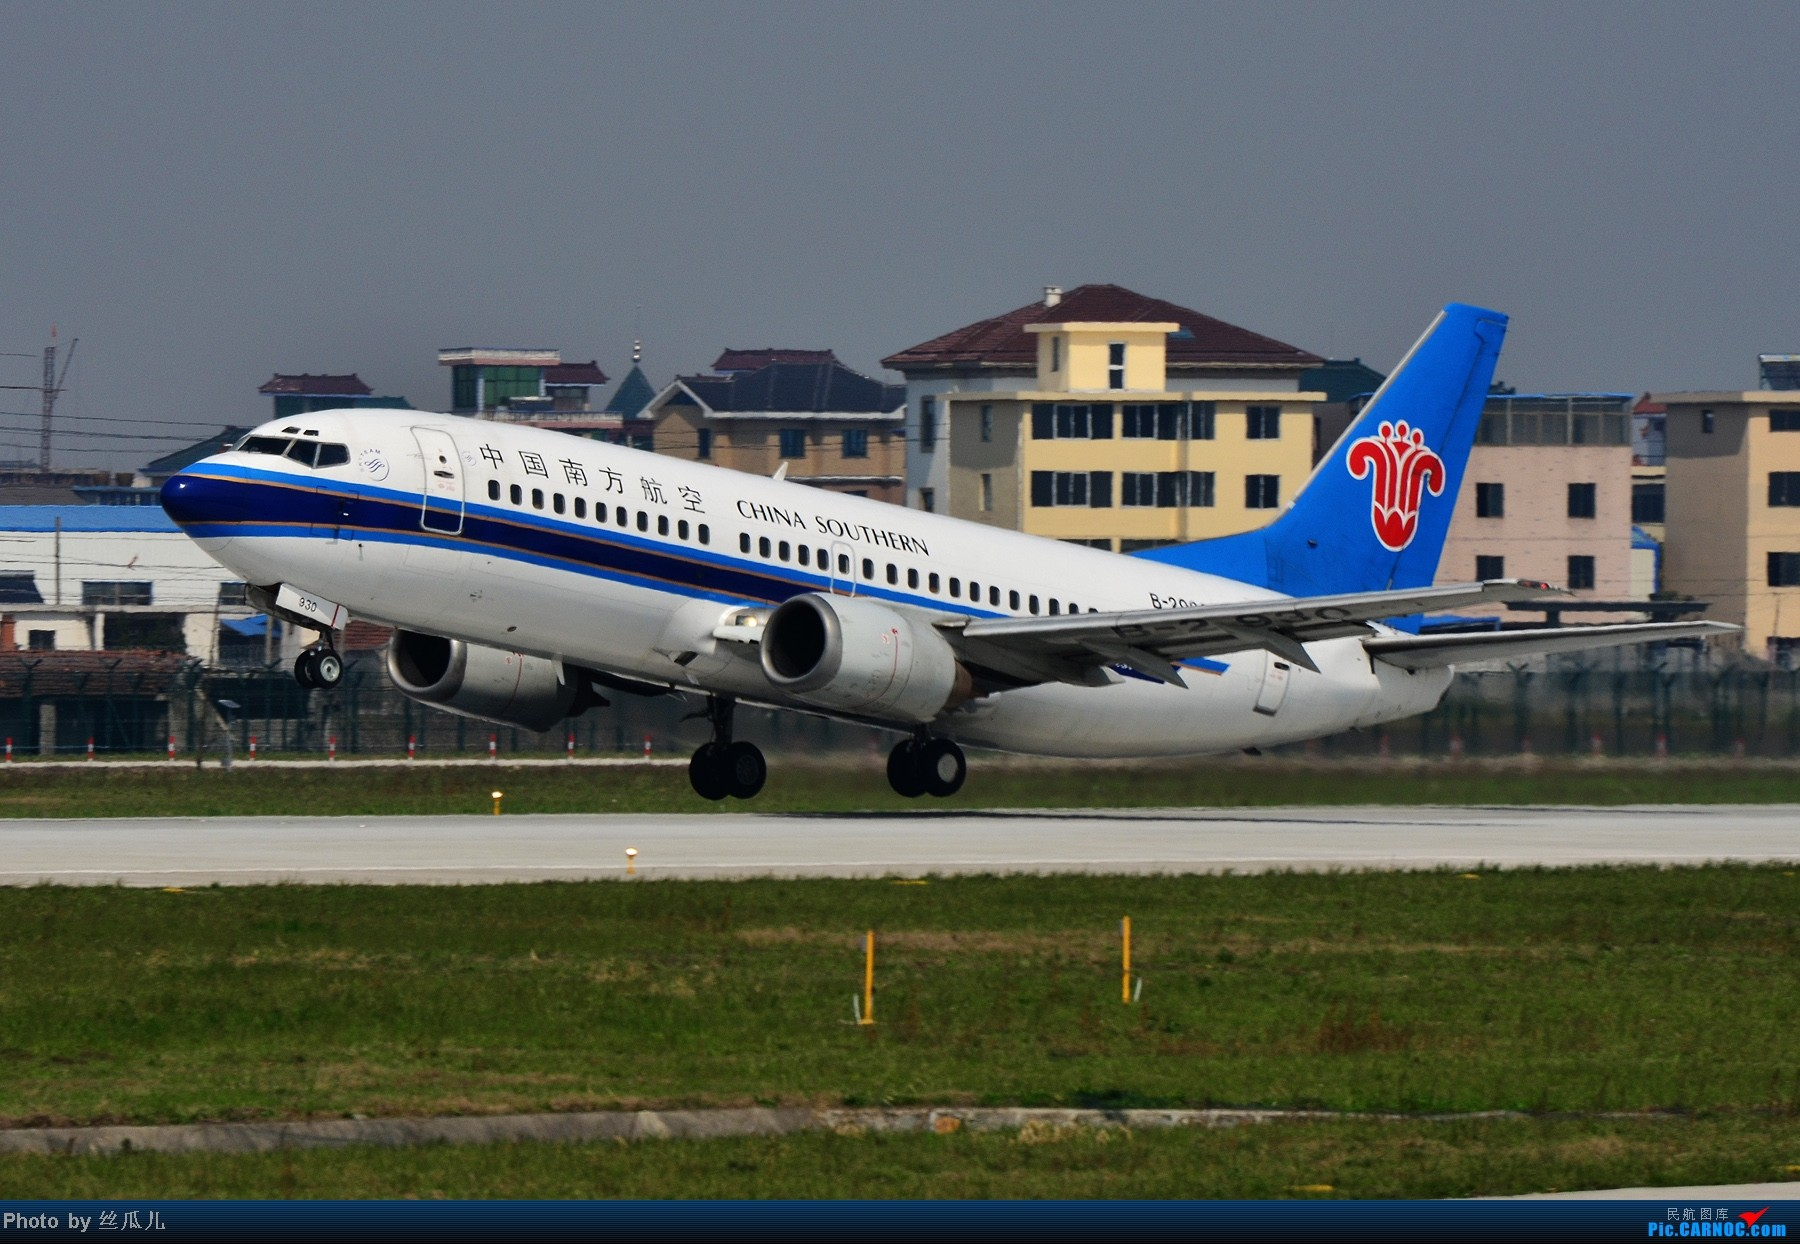 Re:[原创]2013年3月3日-萧山机场-晴 BOEING 737-300 B-2930 中国杭州萧山机场